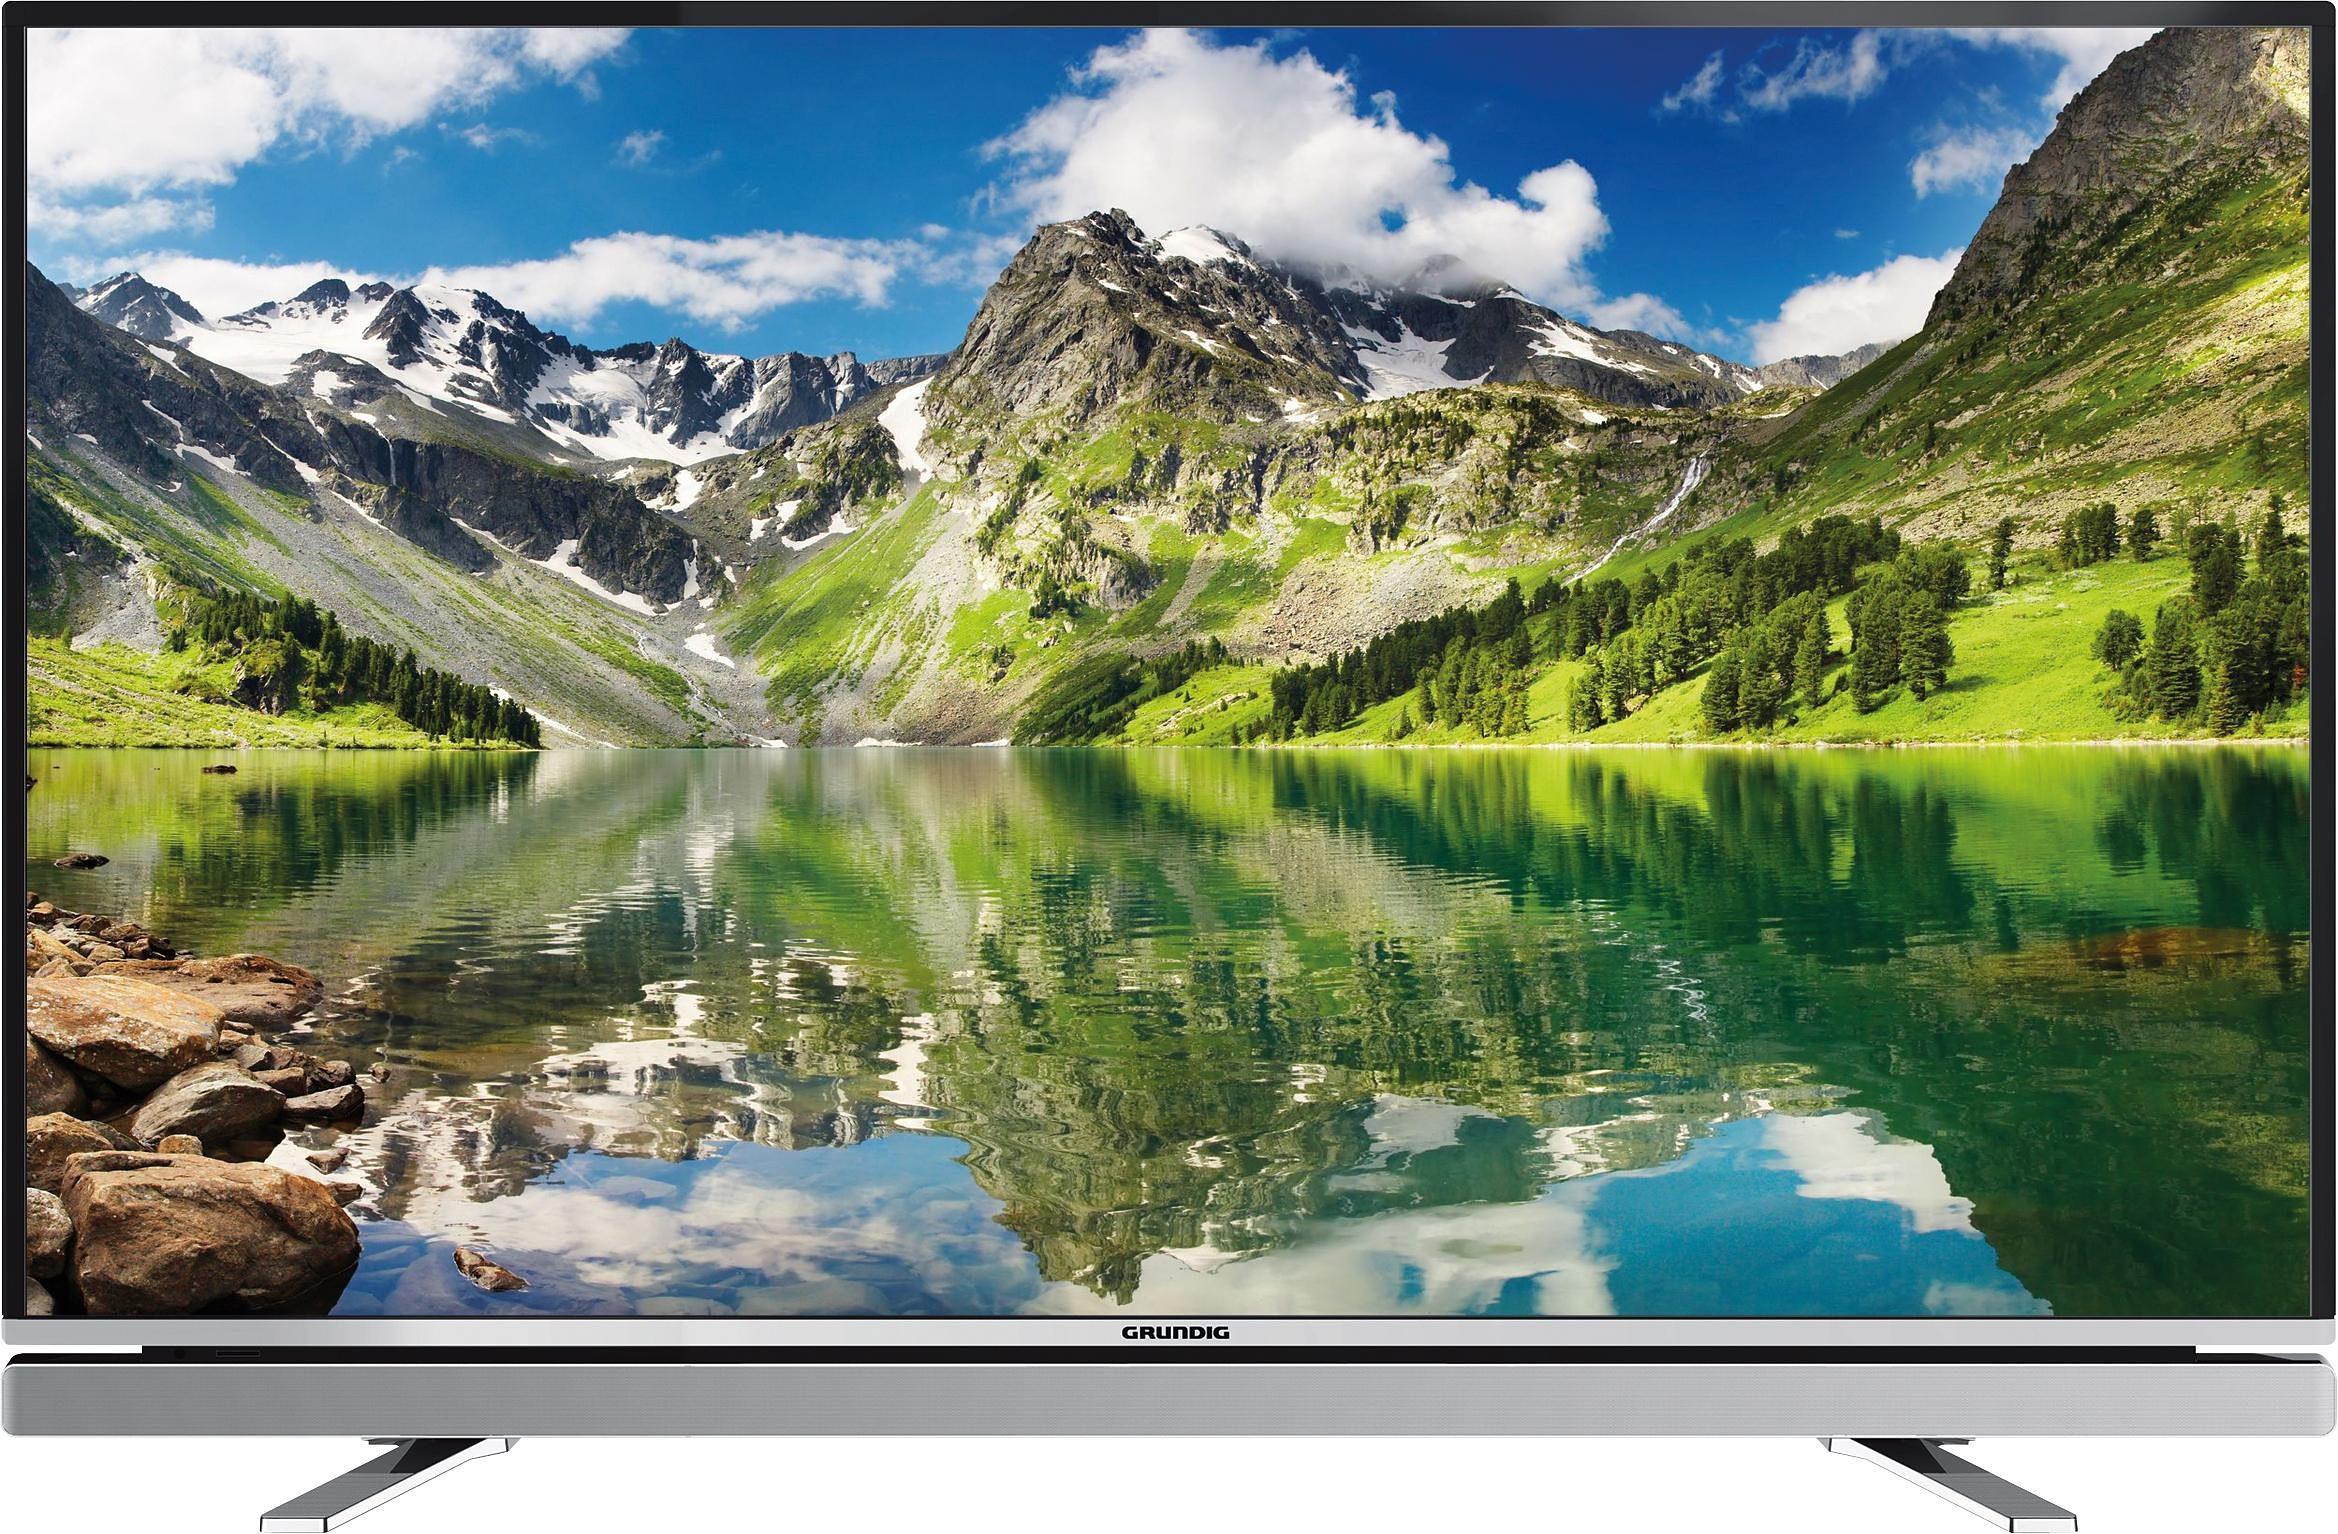 Grundig 55GFB6623 LED-Fernseher (55 Zoll, Full HD, Smart-TV, 36 Monate Garantie)